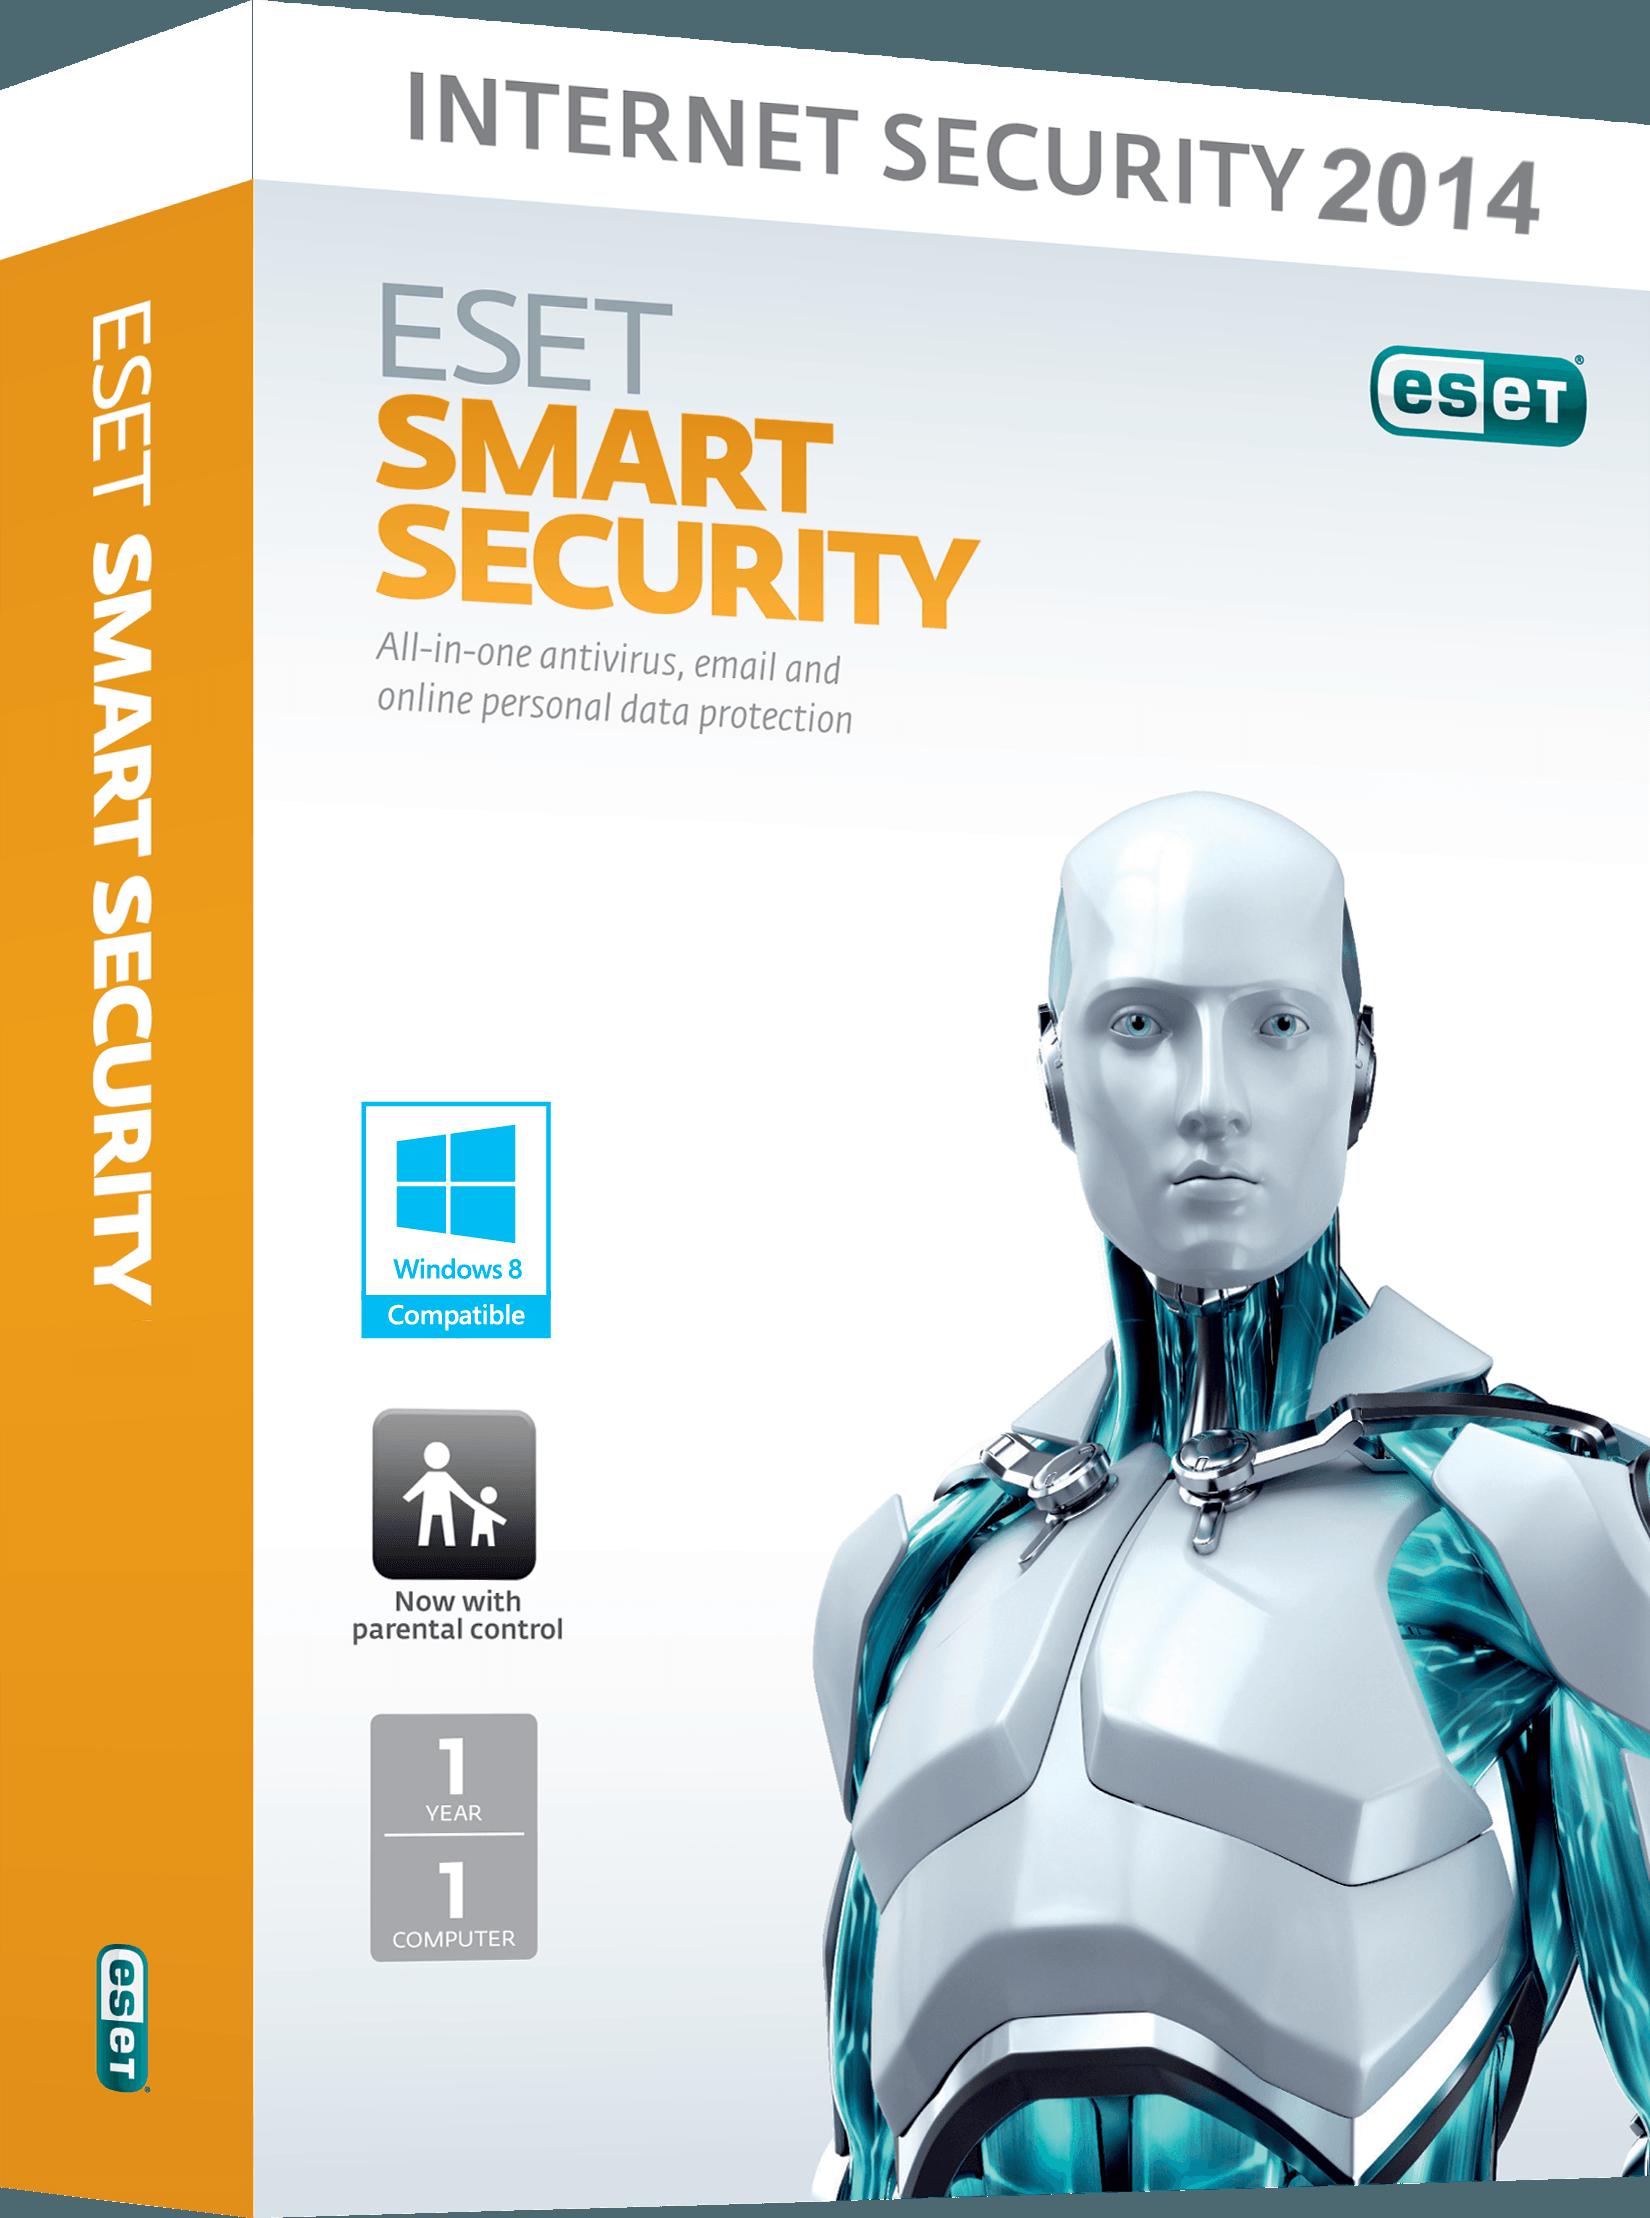 eset smart security 9 activation key generator